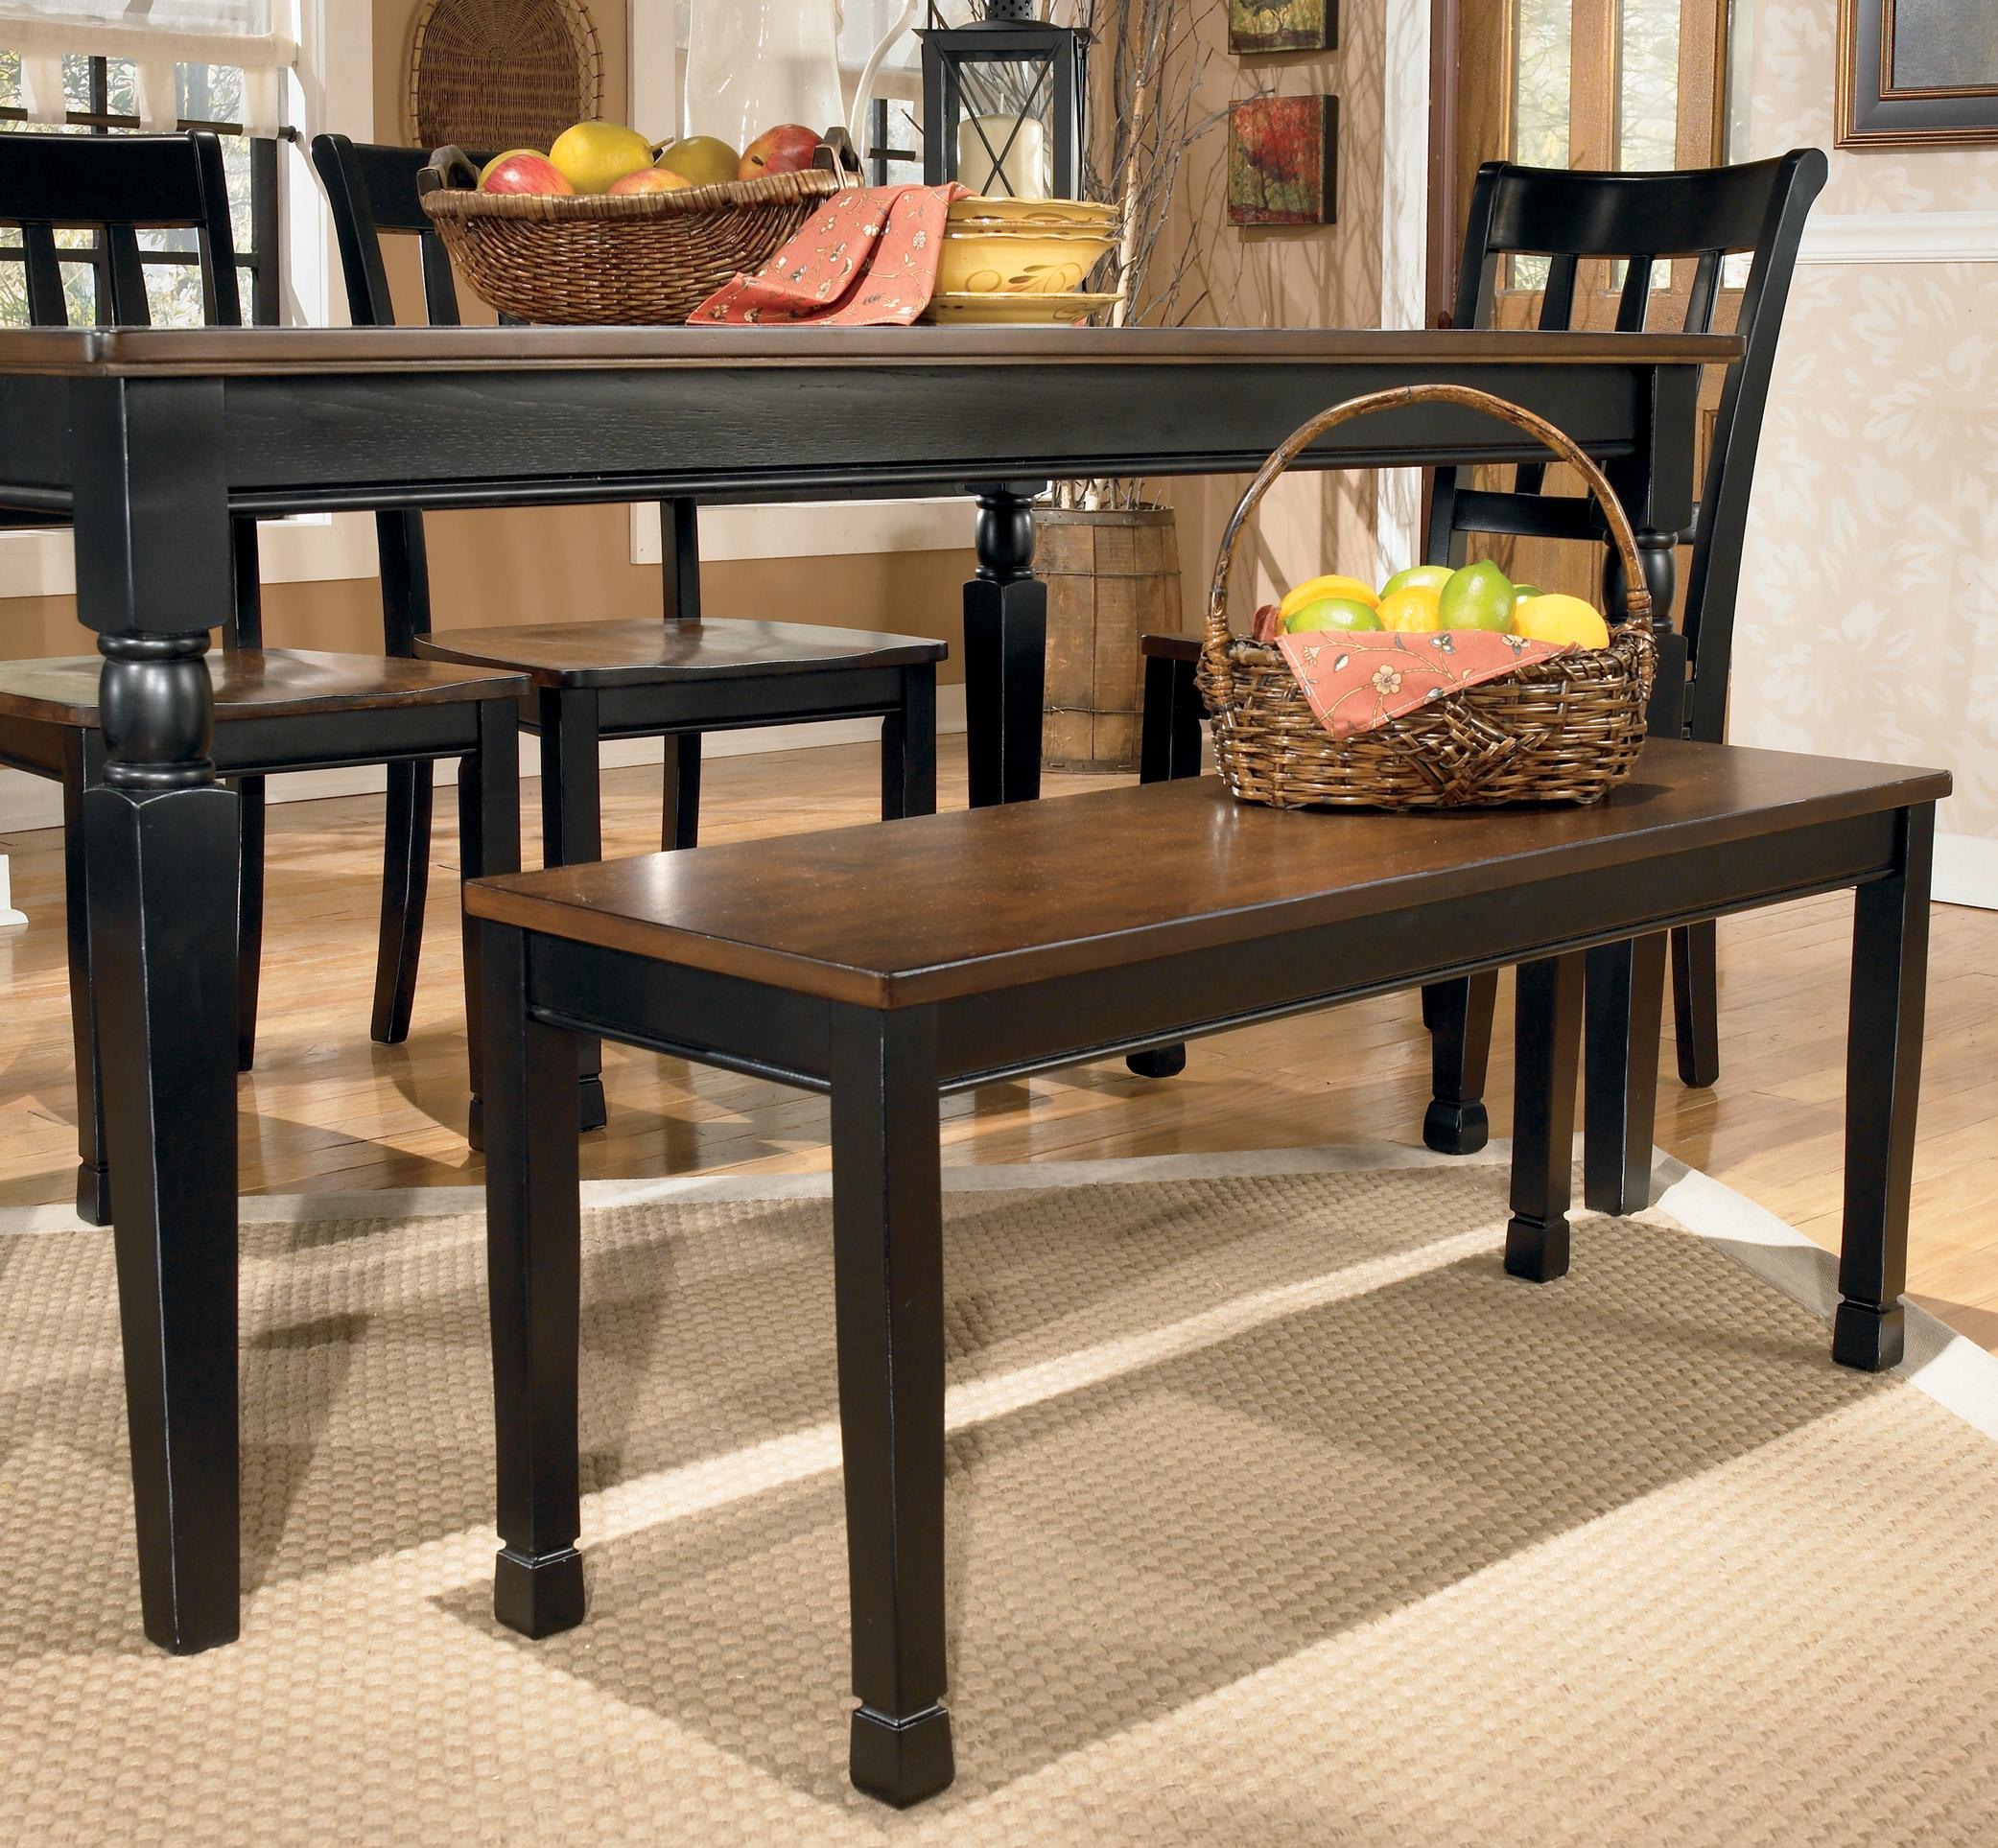 signature design by ashley owingsville large dining room bench royal furniture dining benches. Black Bedroom Furniture Sets. Home Design Ideas